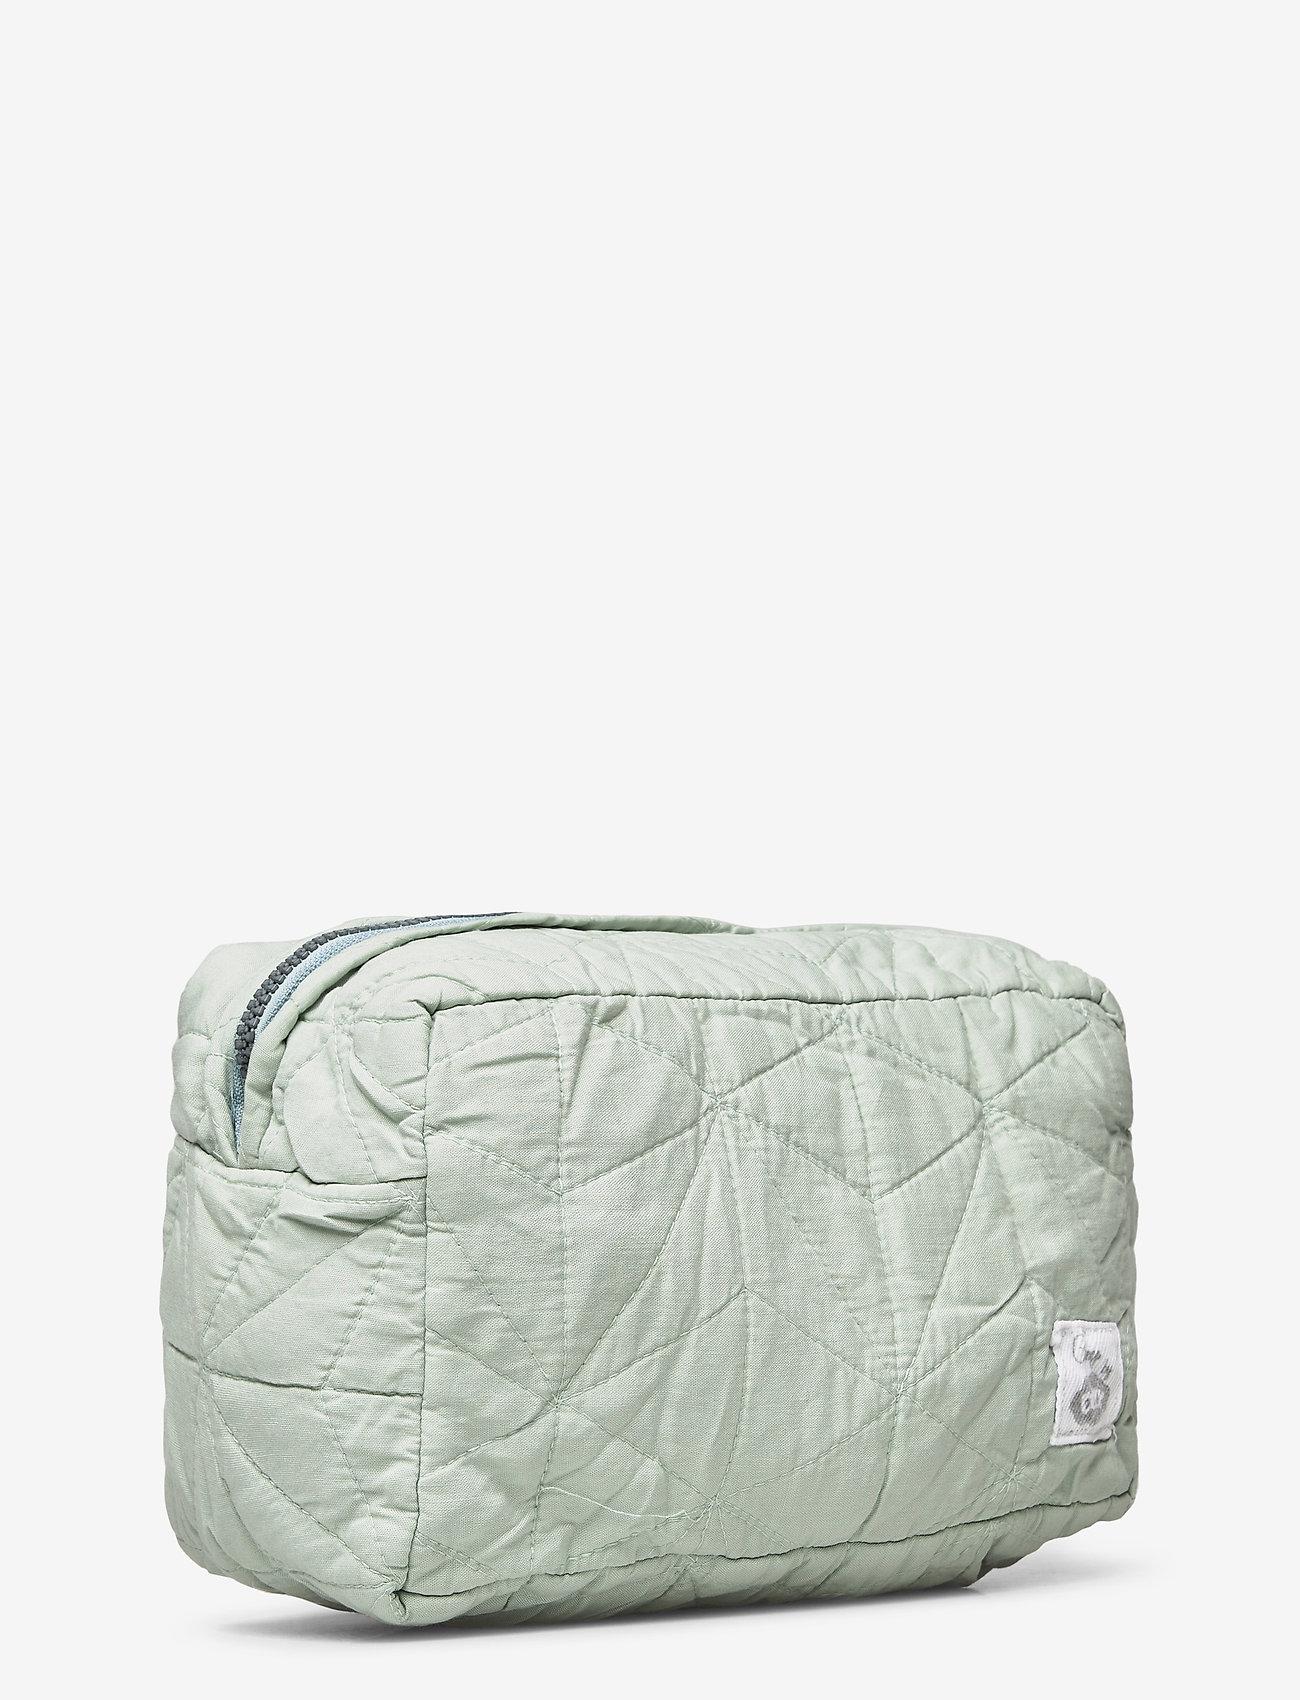 Cozy by Dozy - Cozy by Dozy Toiletry Bag - toiletry bags - green - 2